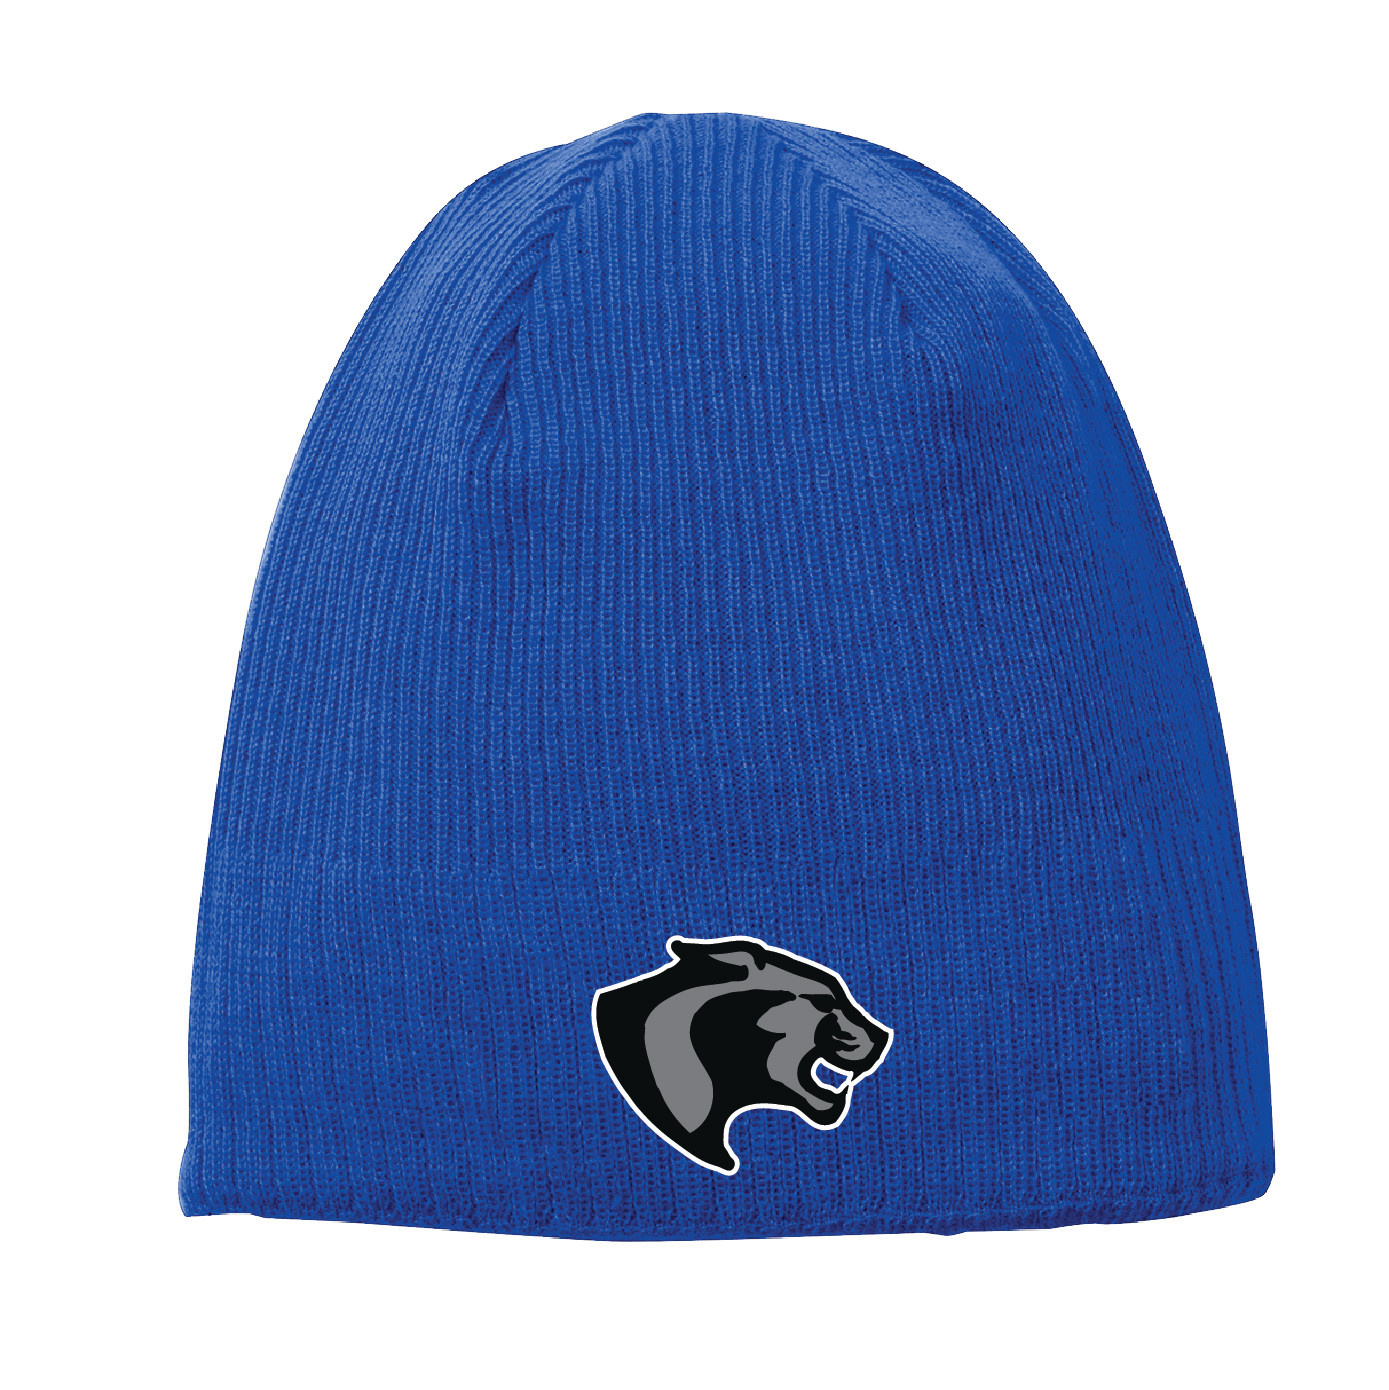 New Era Knit Beanie (Cool Blue)